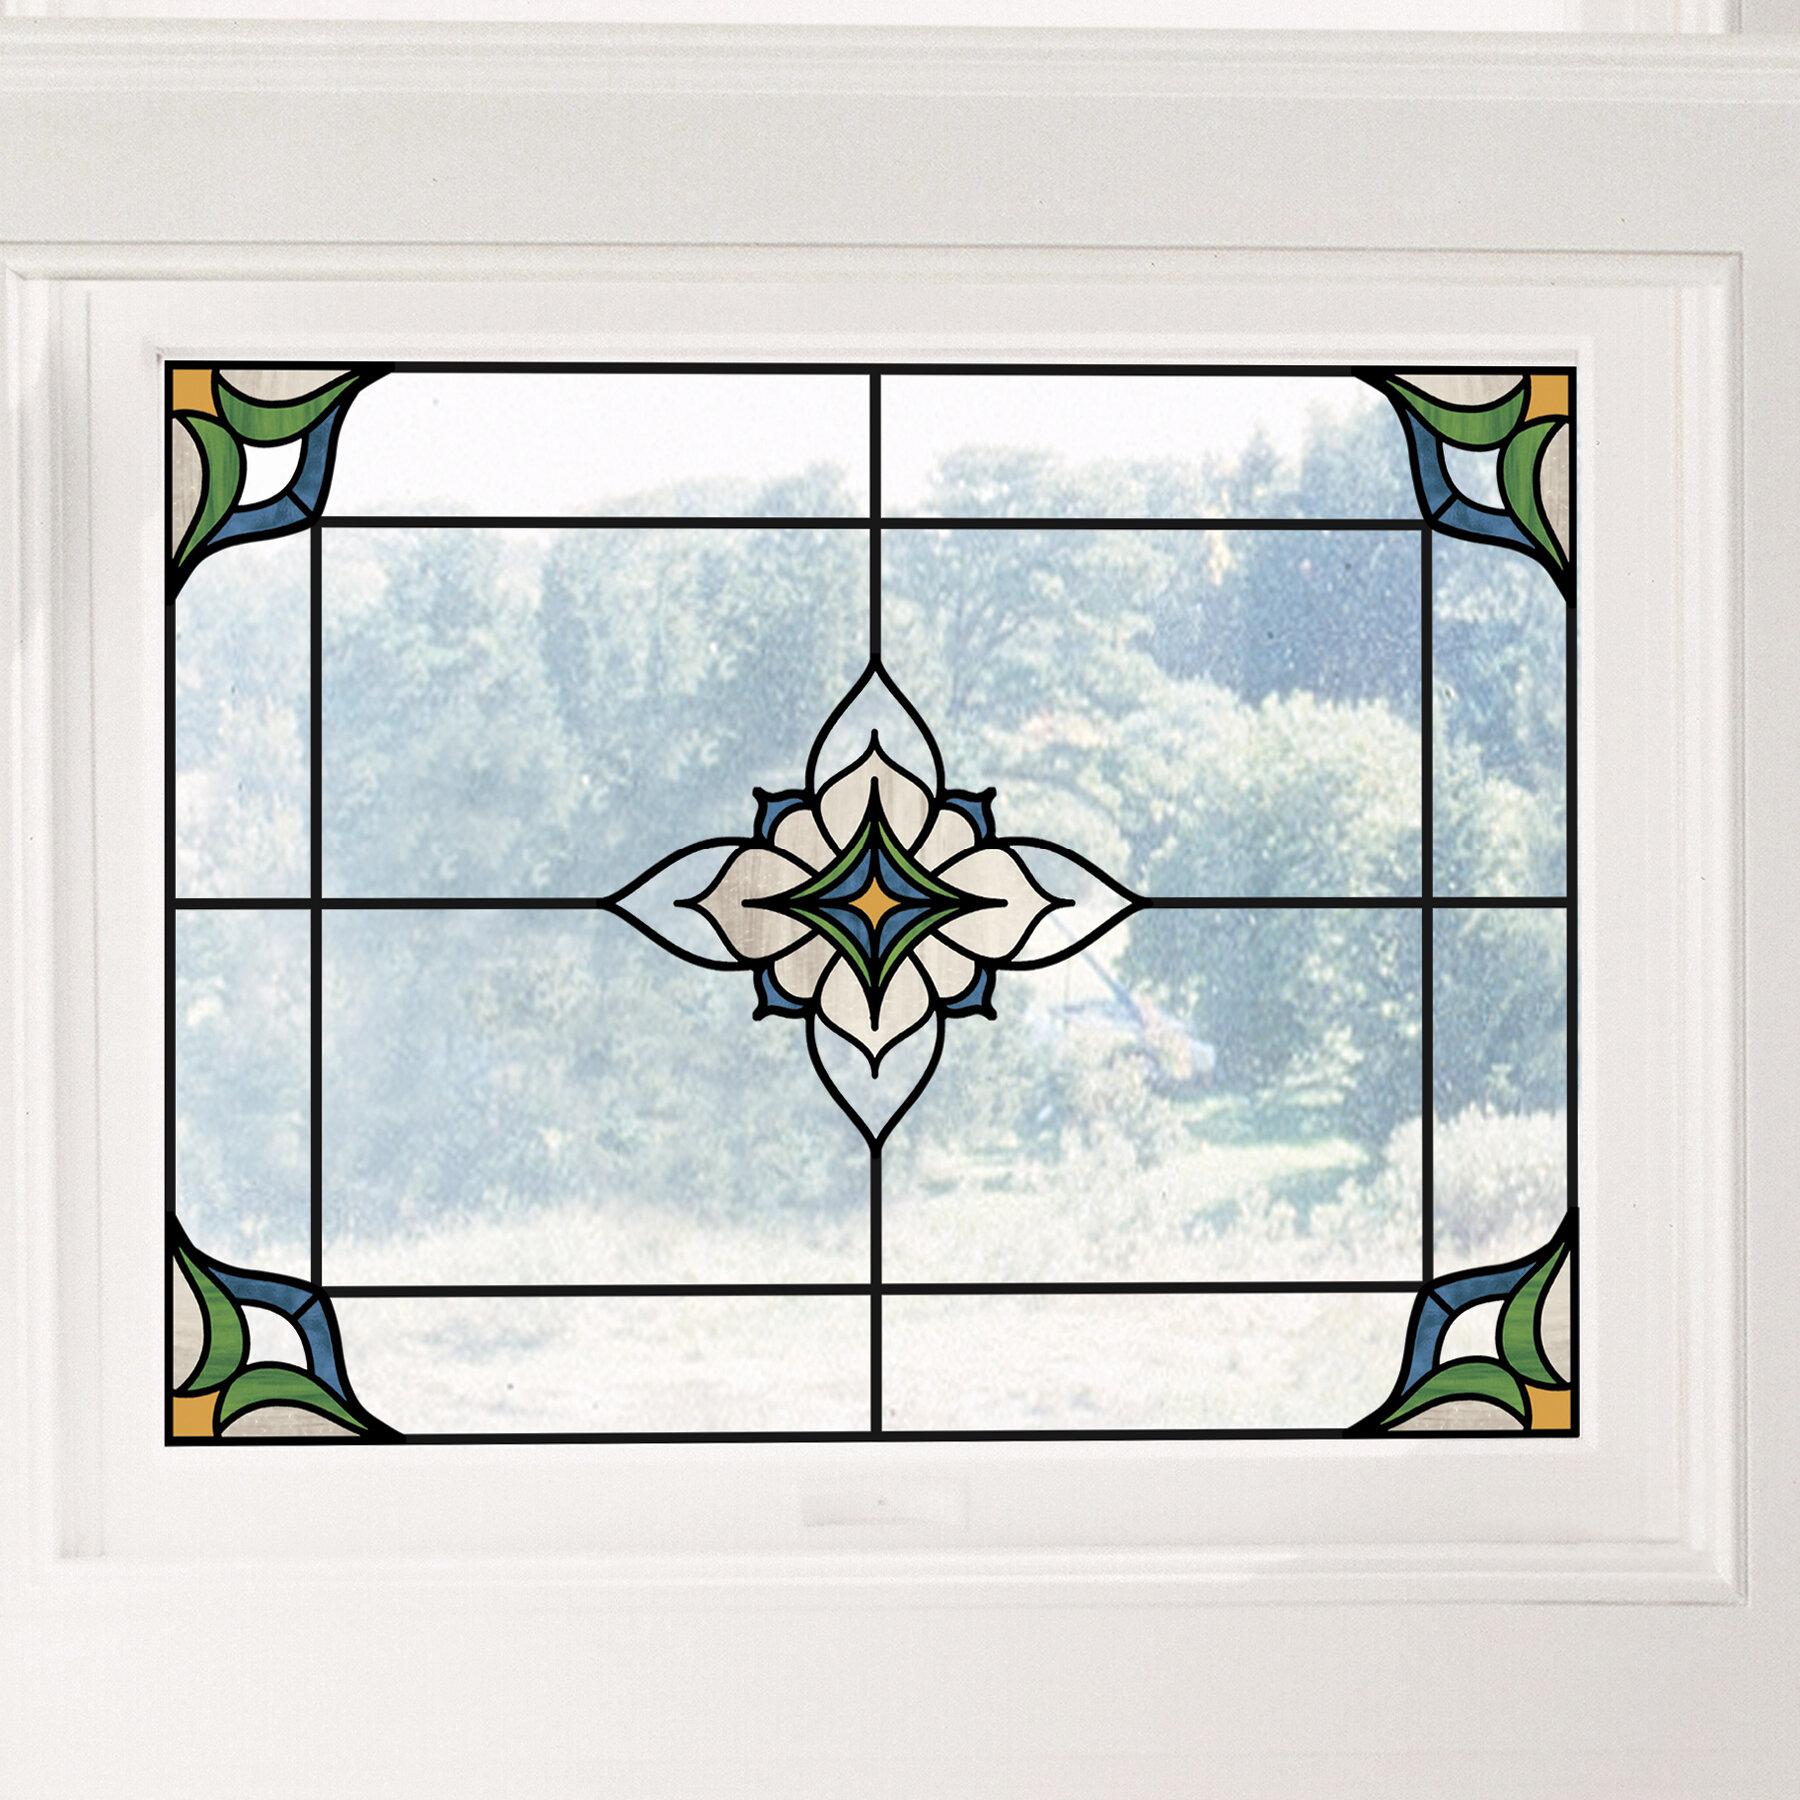 decorative glass block borders for a shower wall or windows.htm fleur de lis living stained glass window decal   reviews wayfair  fleur de lis living stained glass